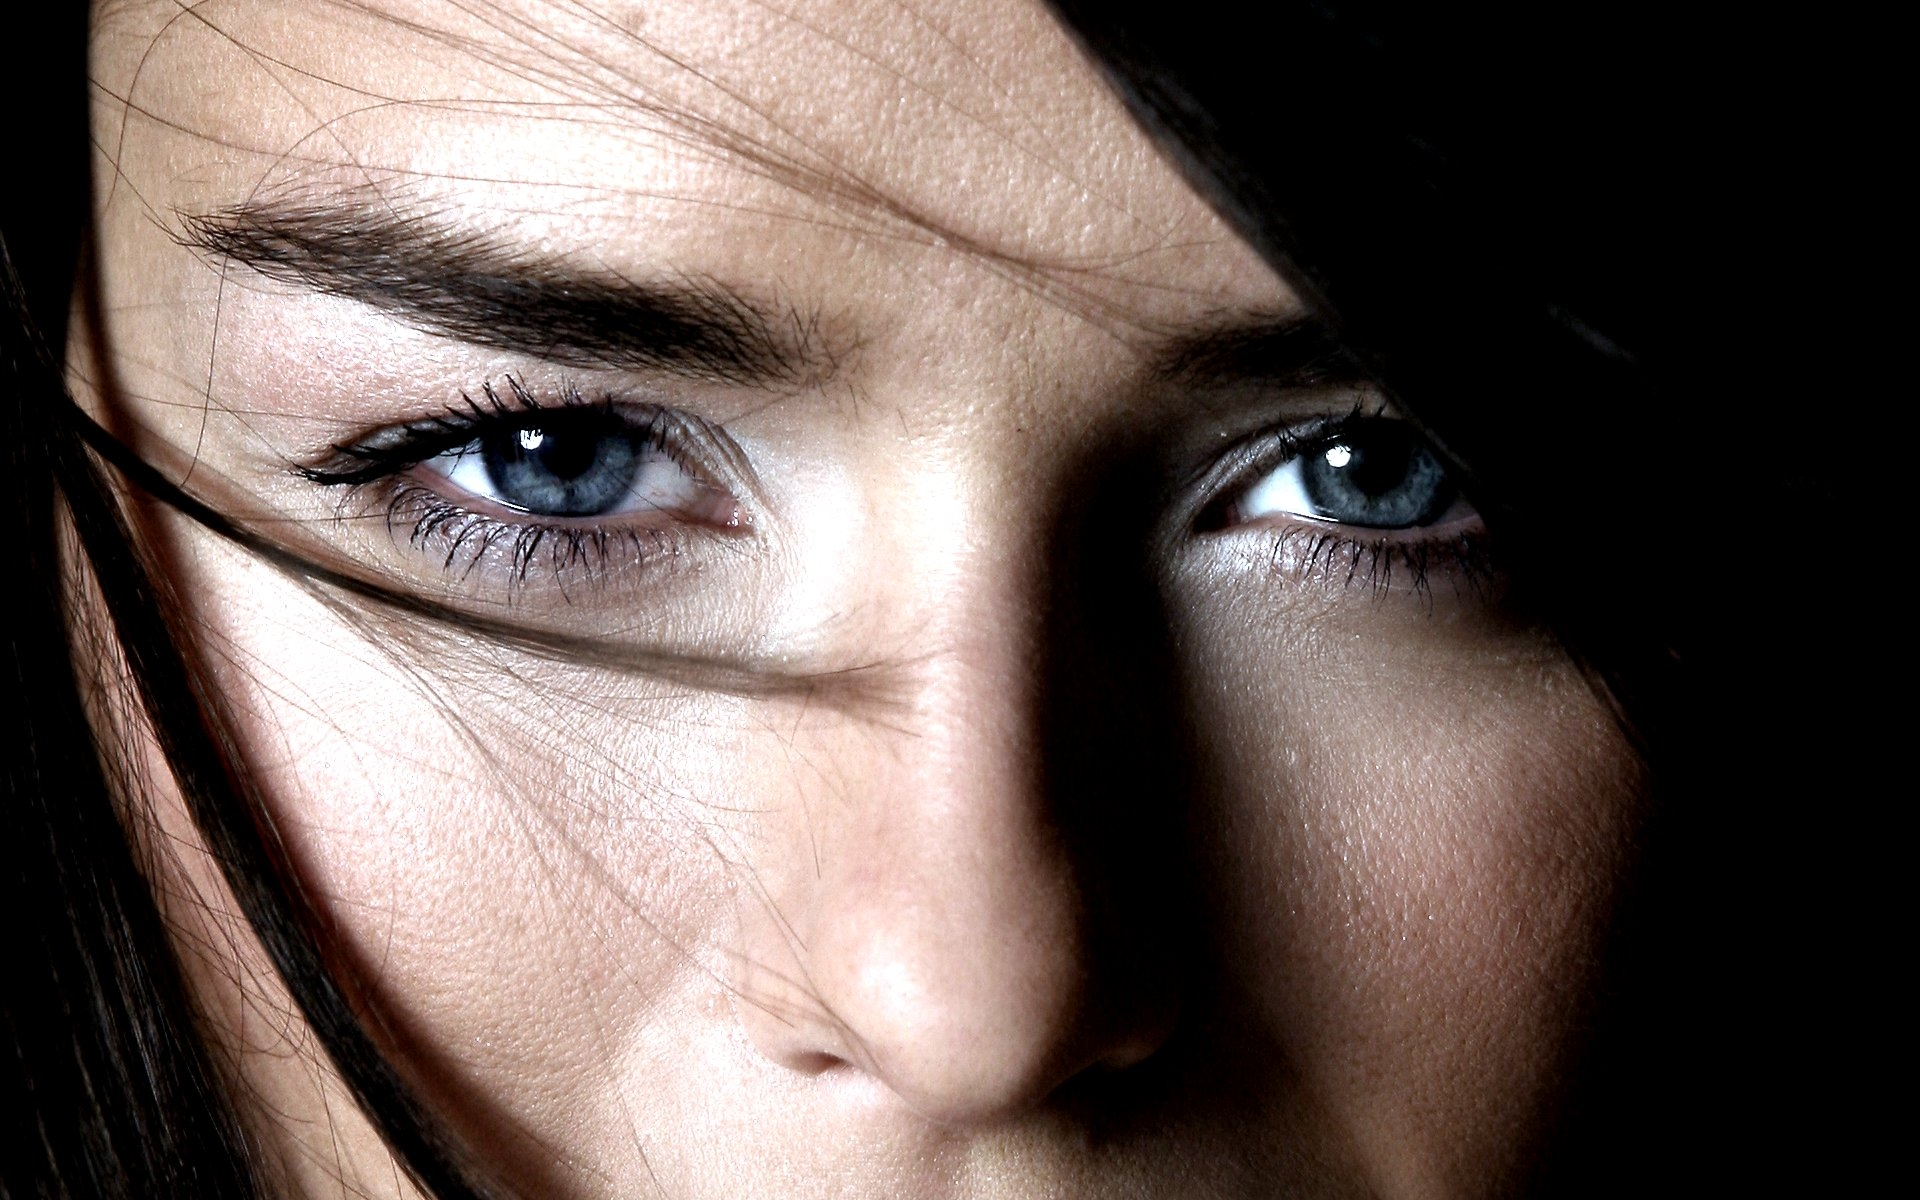 Ojos azules - 1920x1200